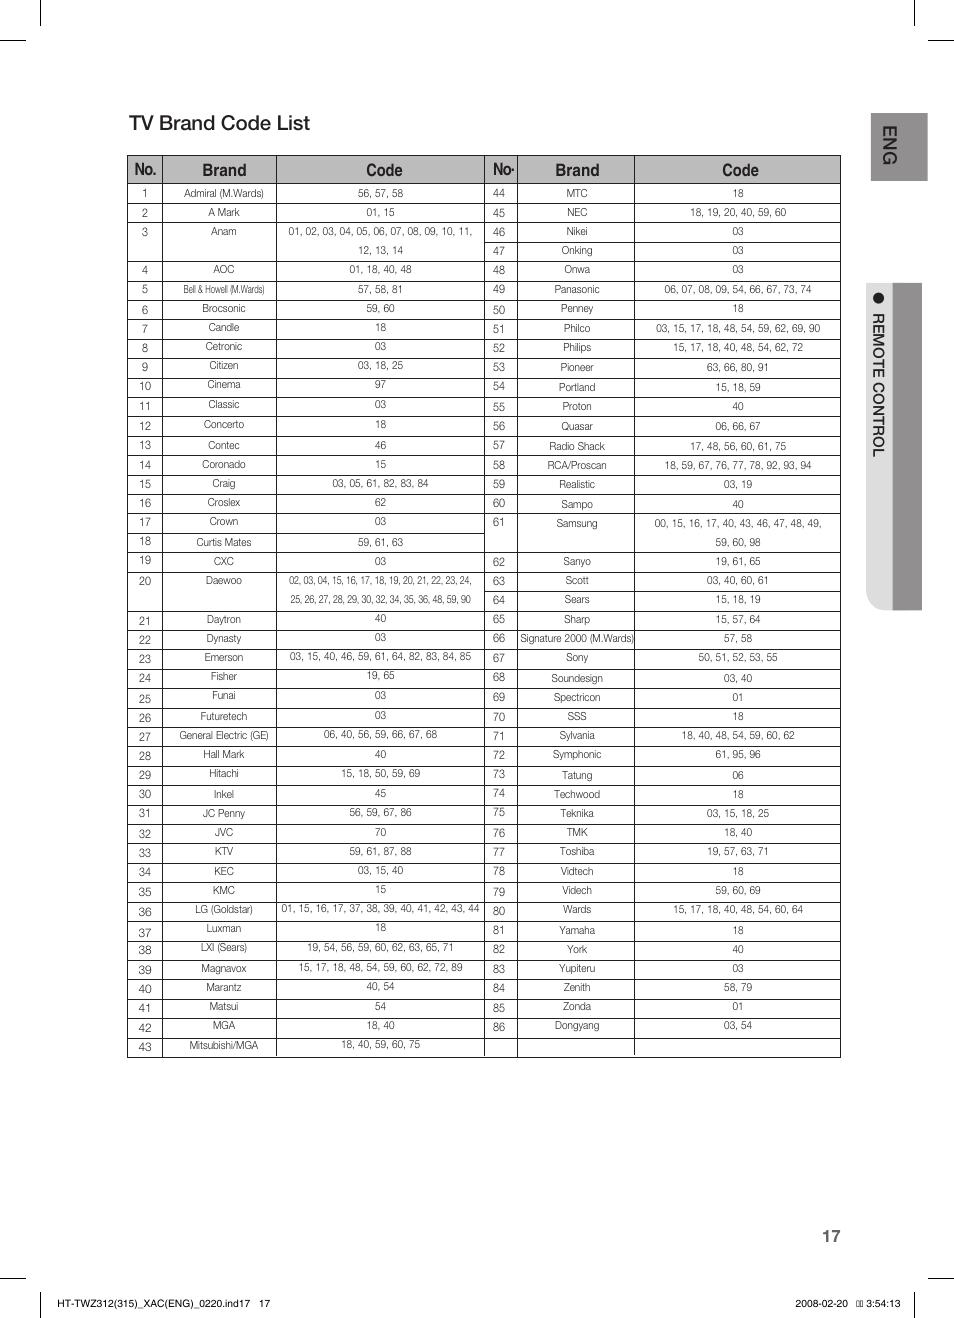 Tv brand code list, No. brand code no. brand code